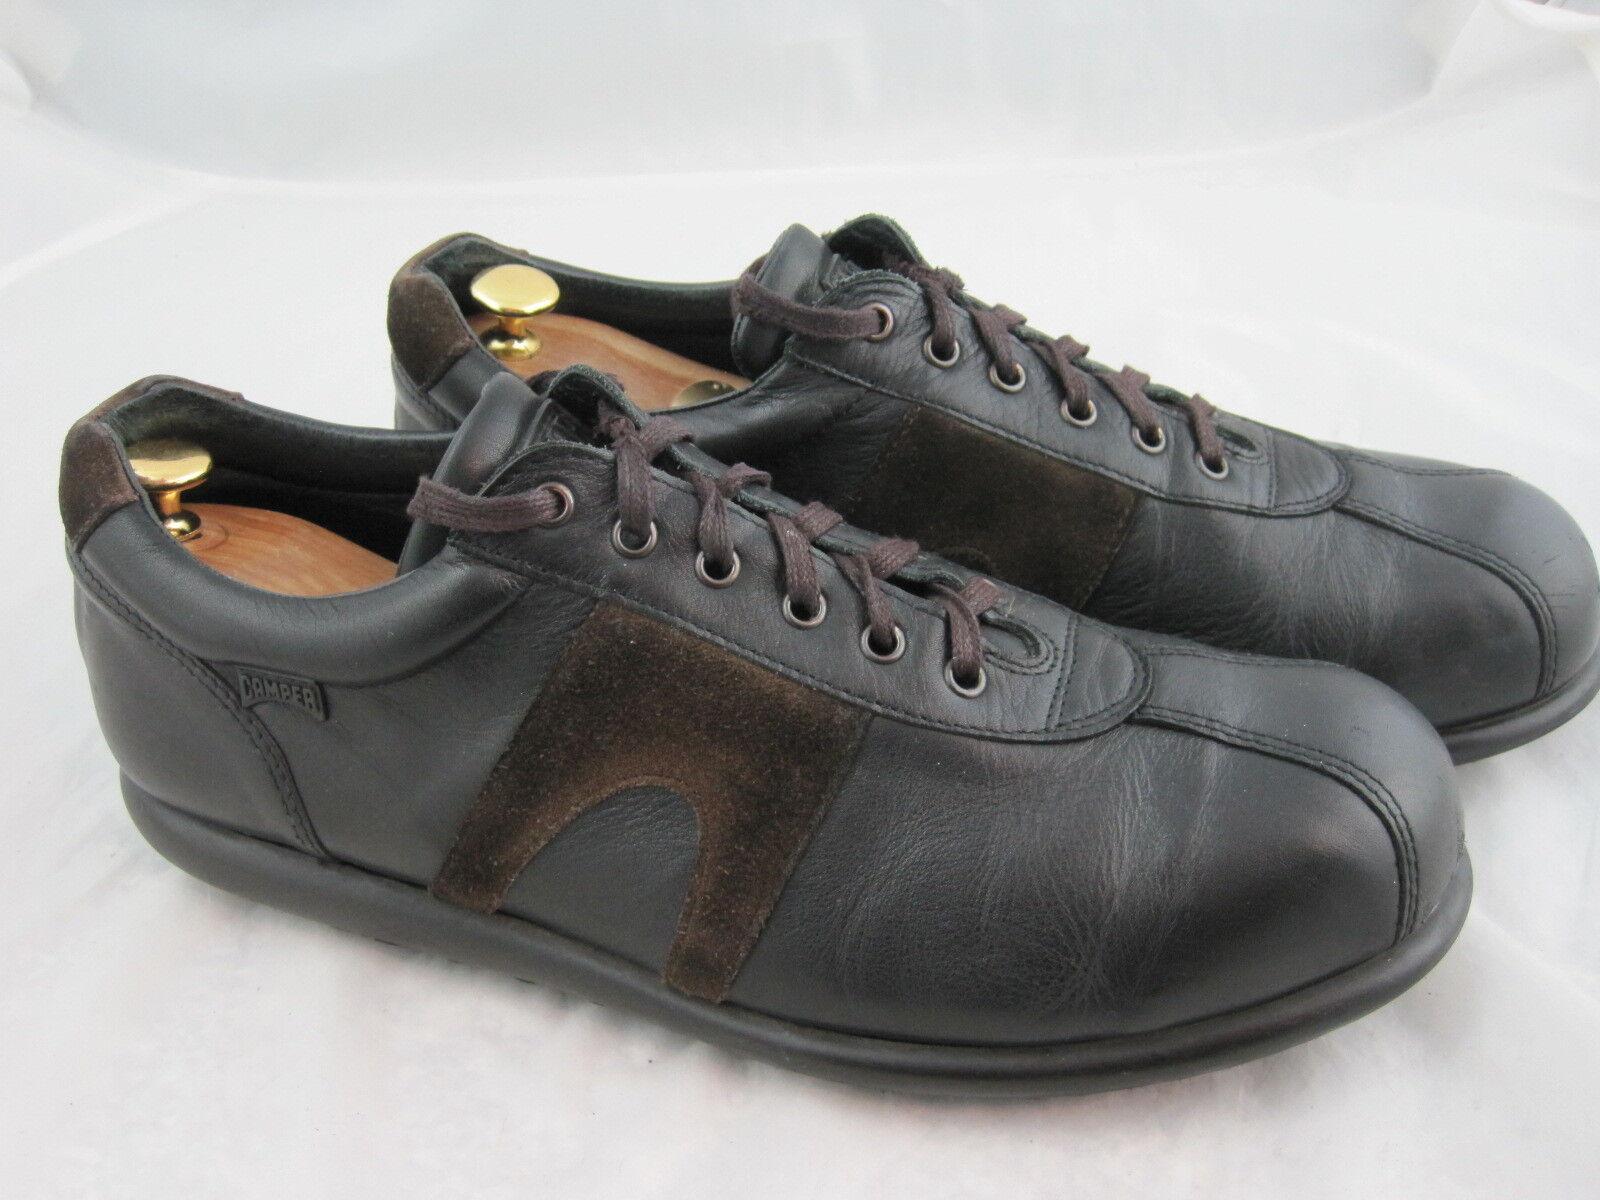 Camper Pelotas Chaussures Hommes en 47 UK 12 Bon état NOIR